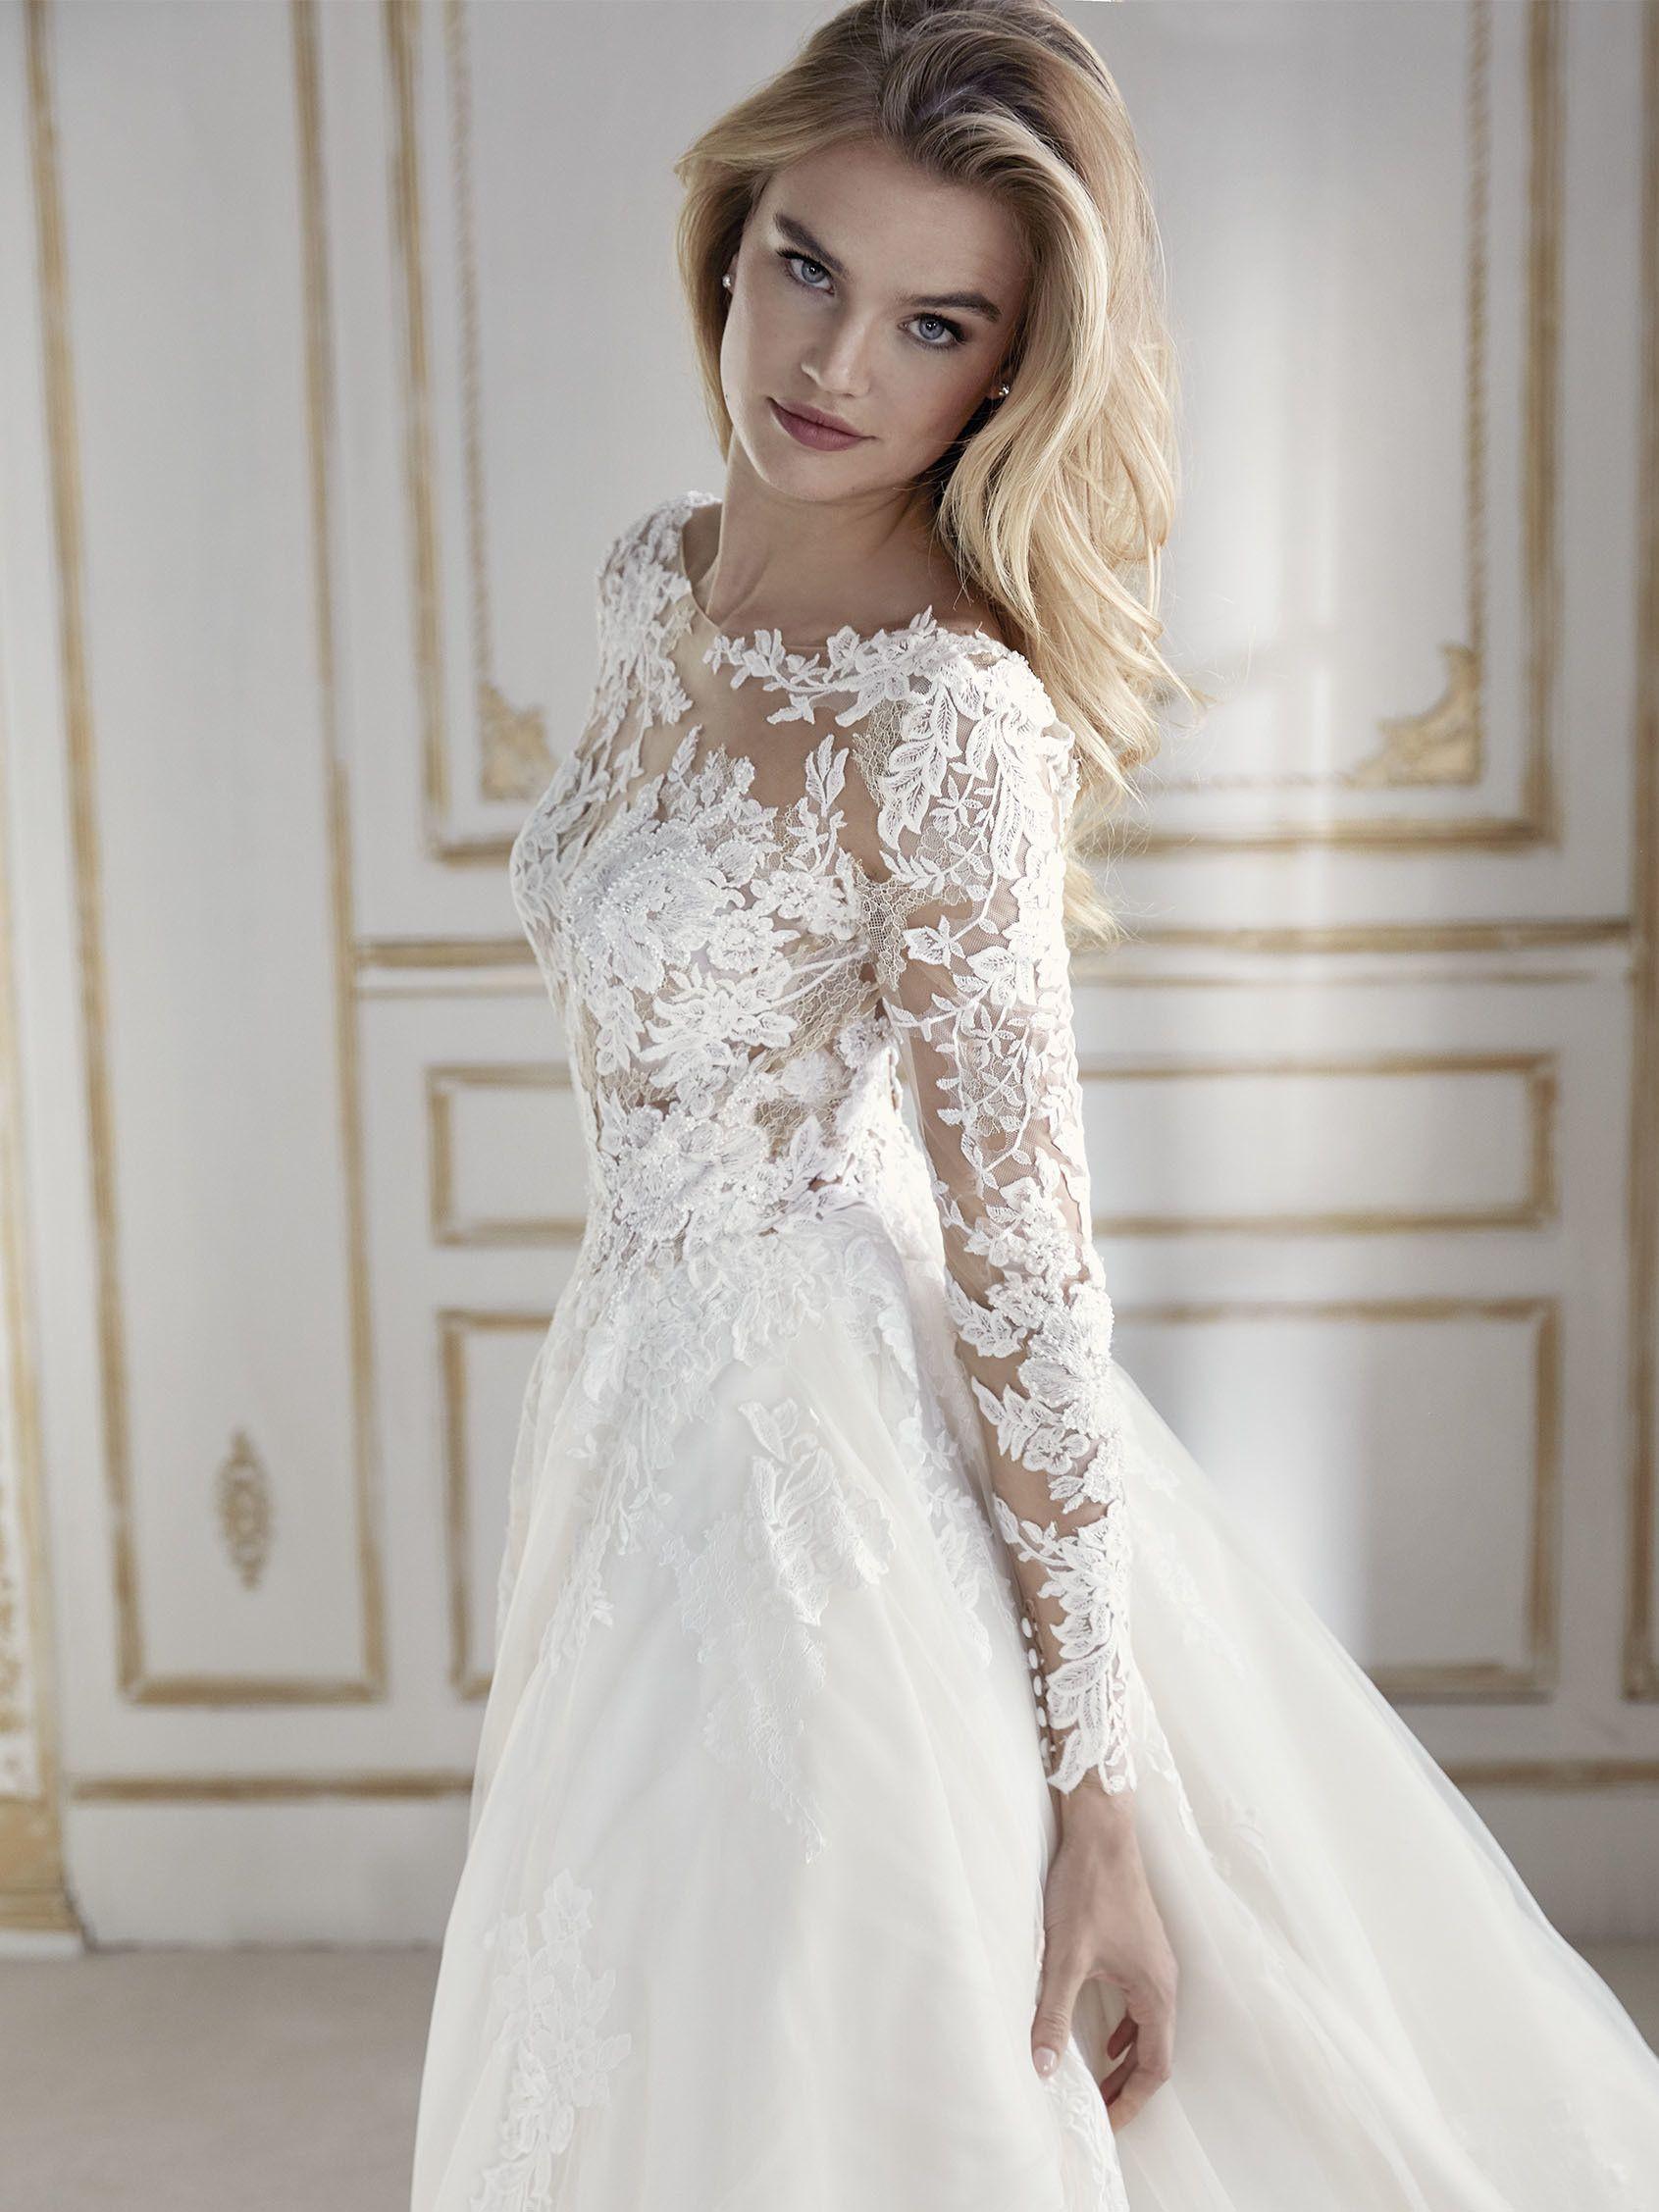 Brautkleid im Prinzessin-Stil | Wedding Dresses | Pinterest ...